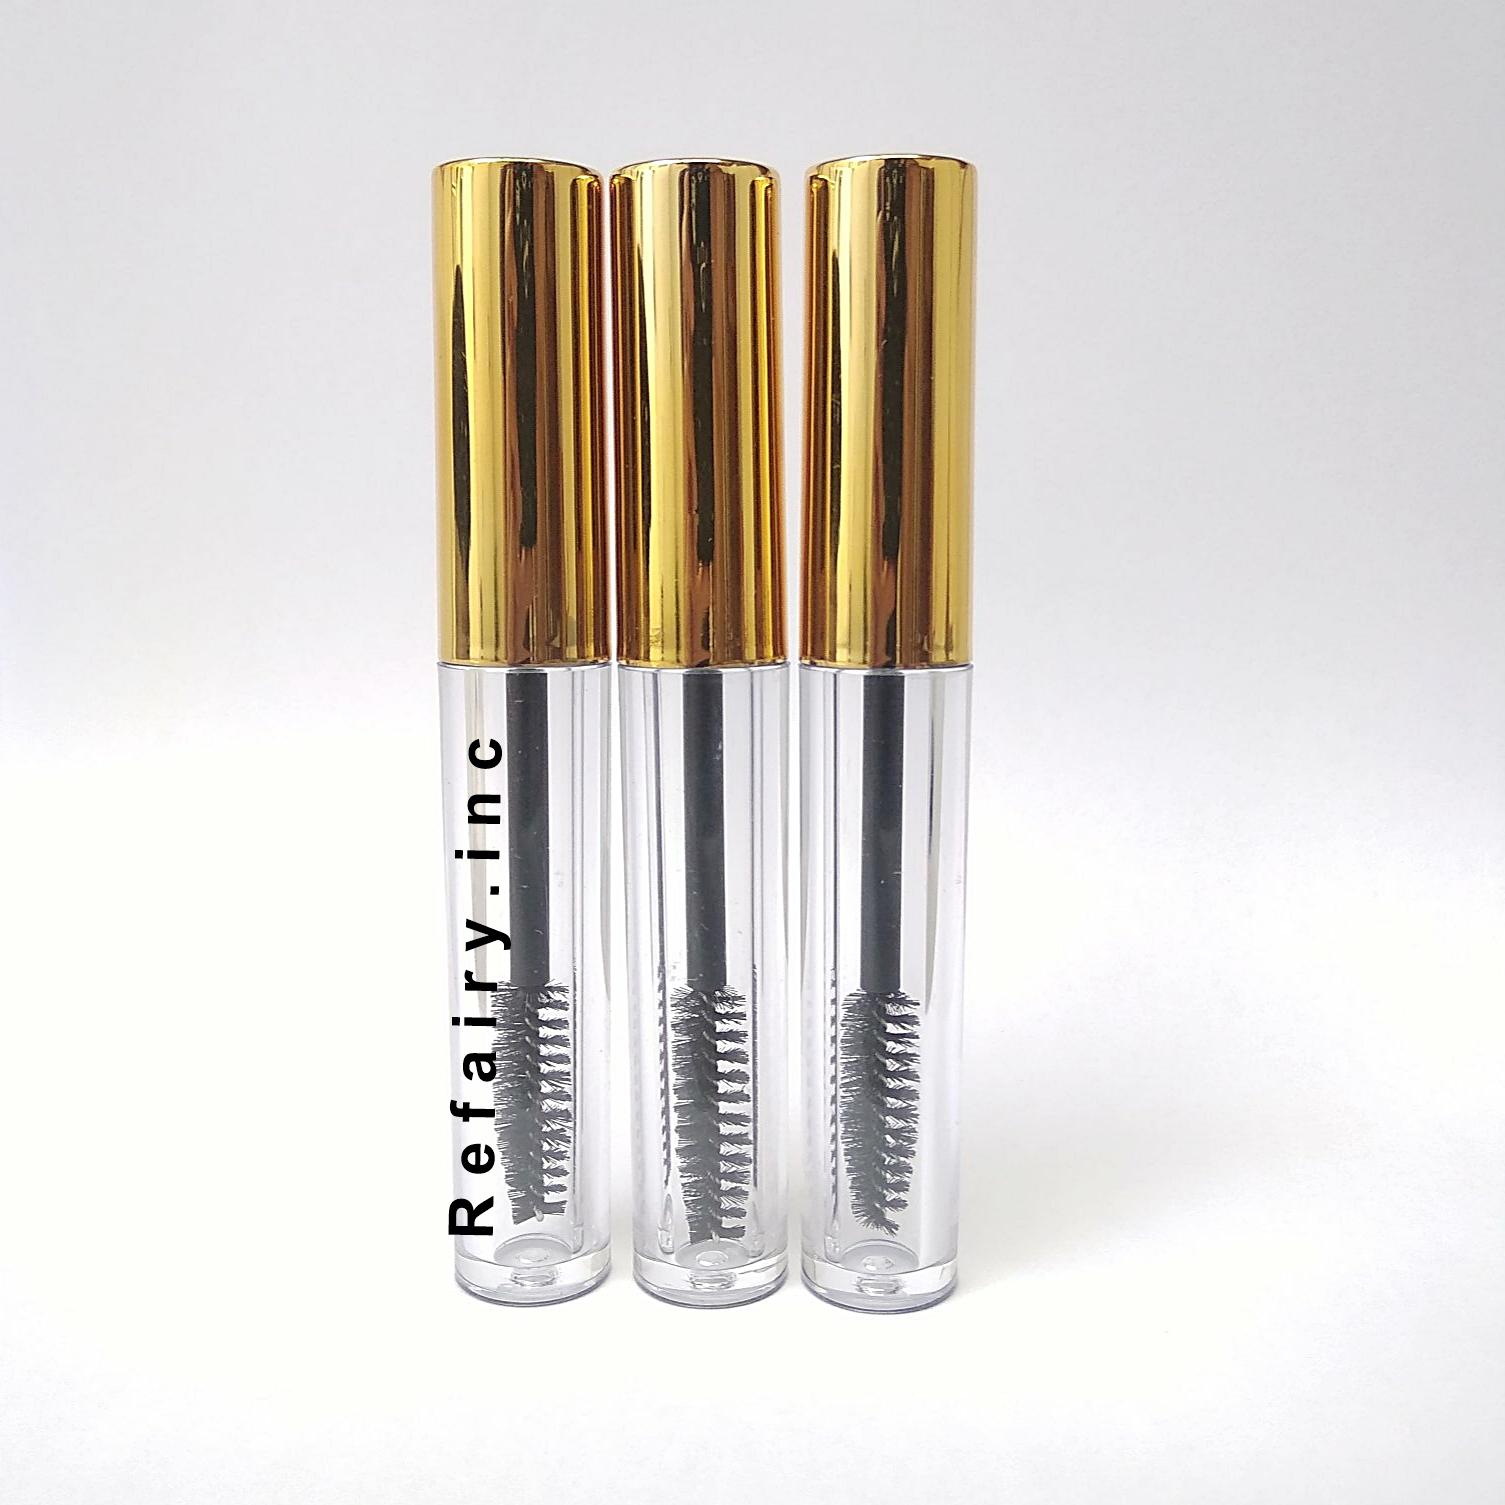 Botol Maskara 4 ml acrylic Tempat wadah mascara 4 ml akrilik - Gold thumbnail